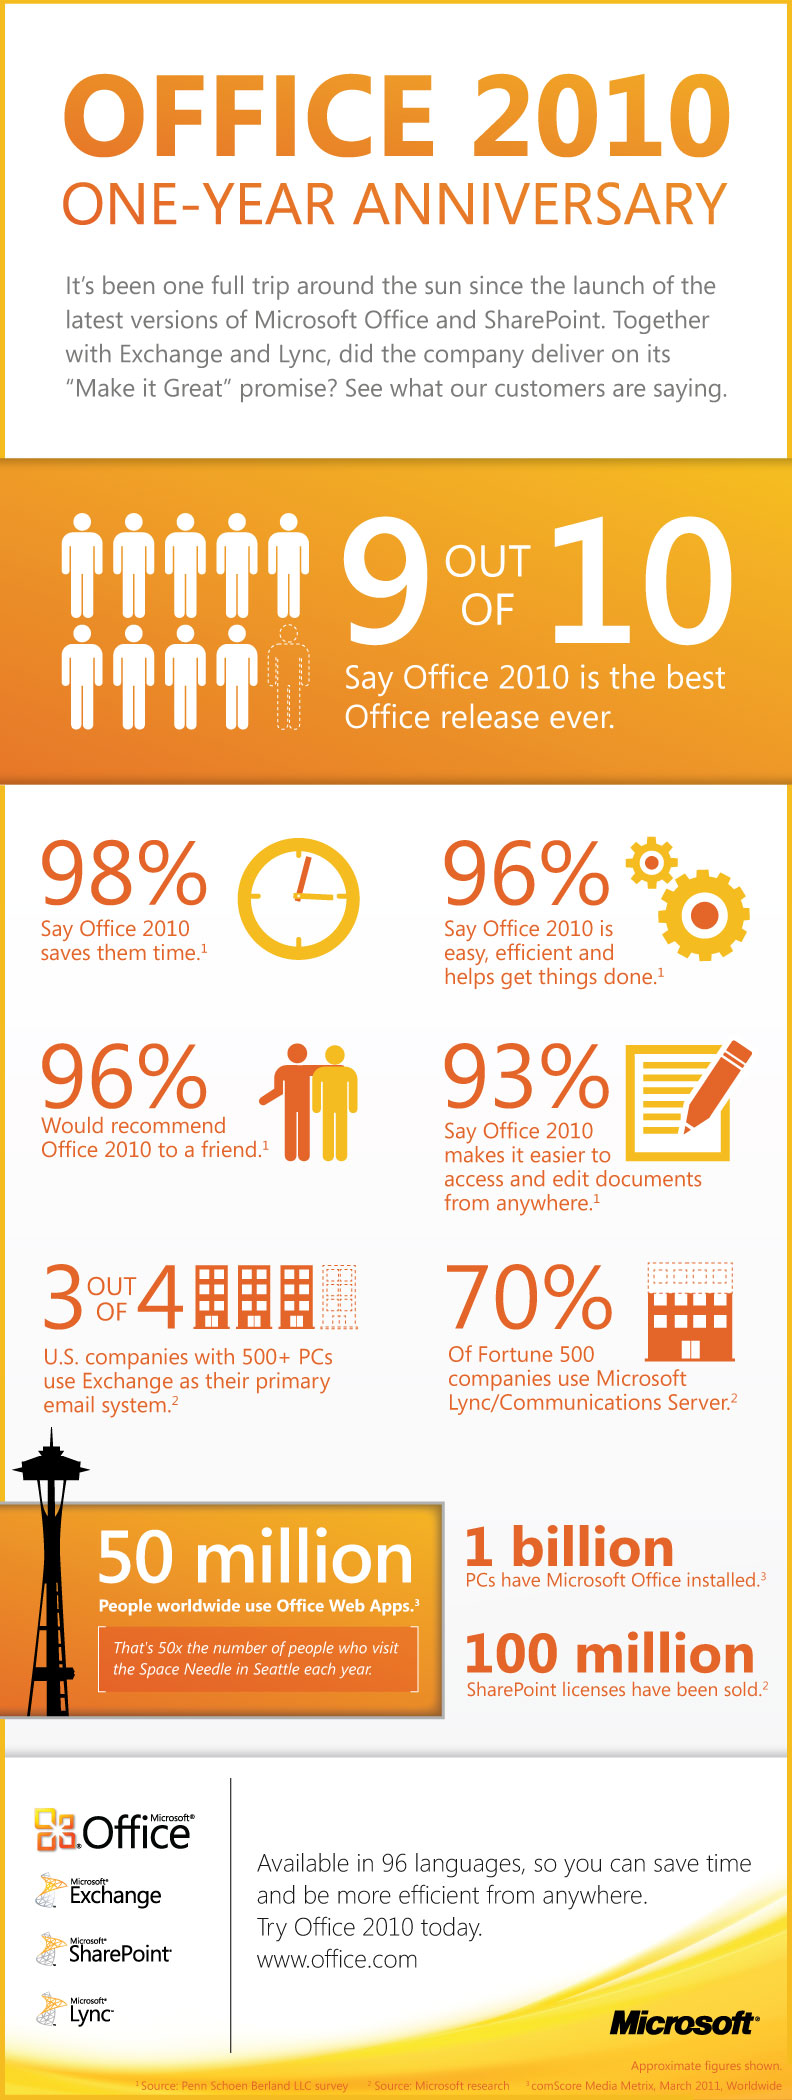 Microsoft Office 2010 One-Year Anniversary Infographic